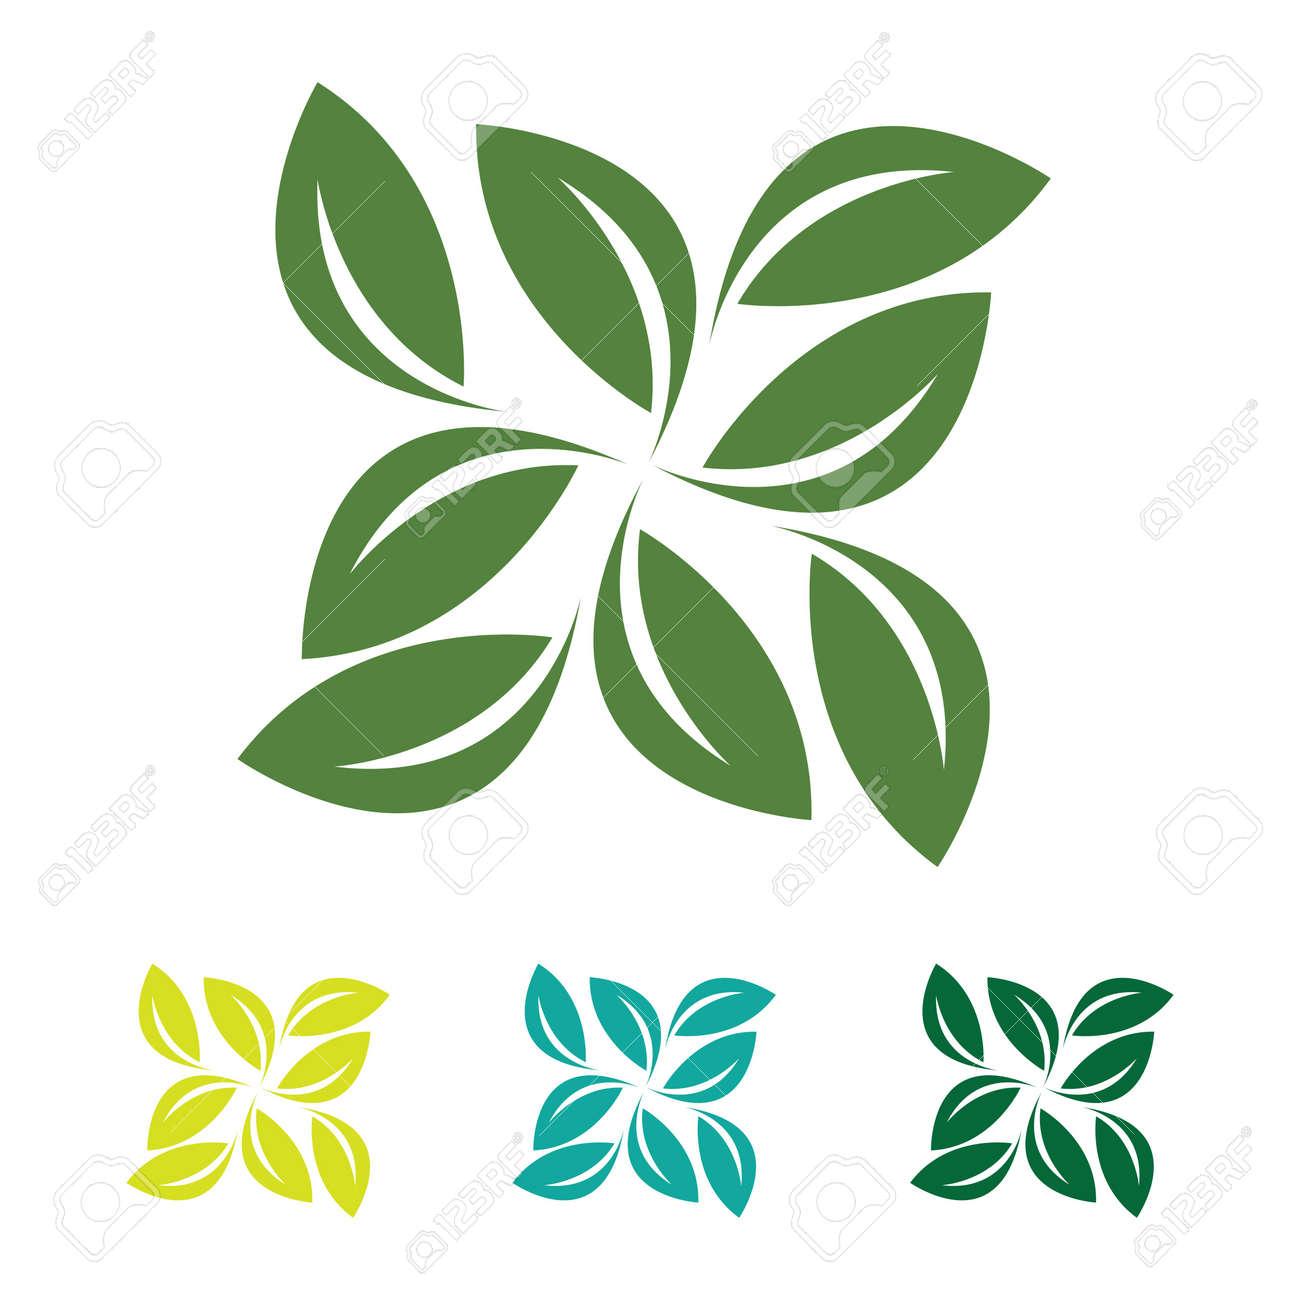 eco green leaf logo vector - 154366536